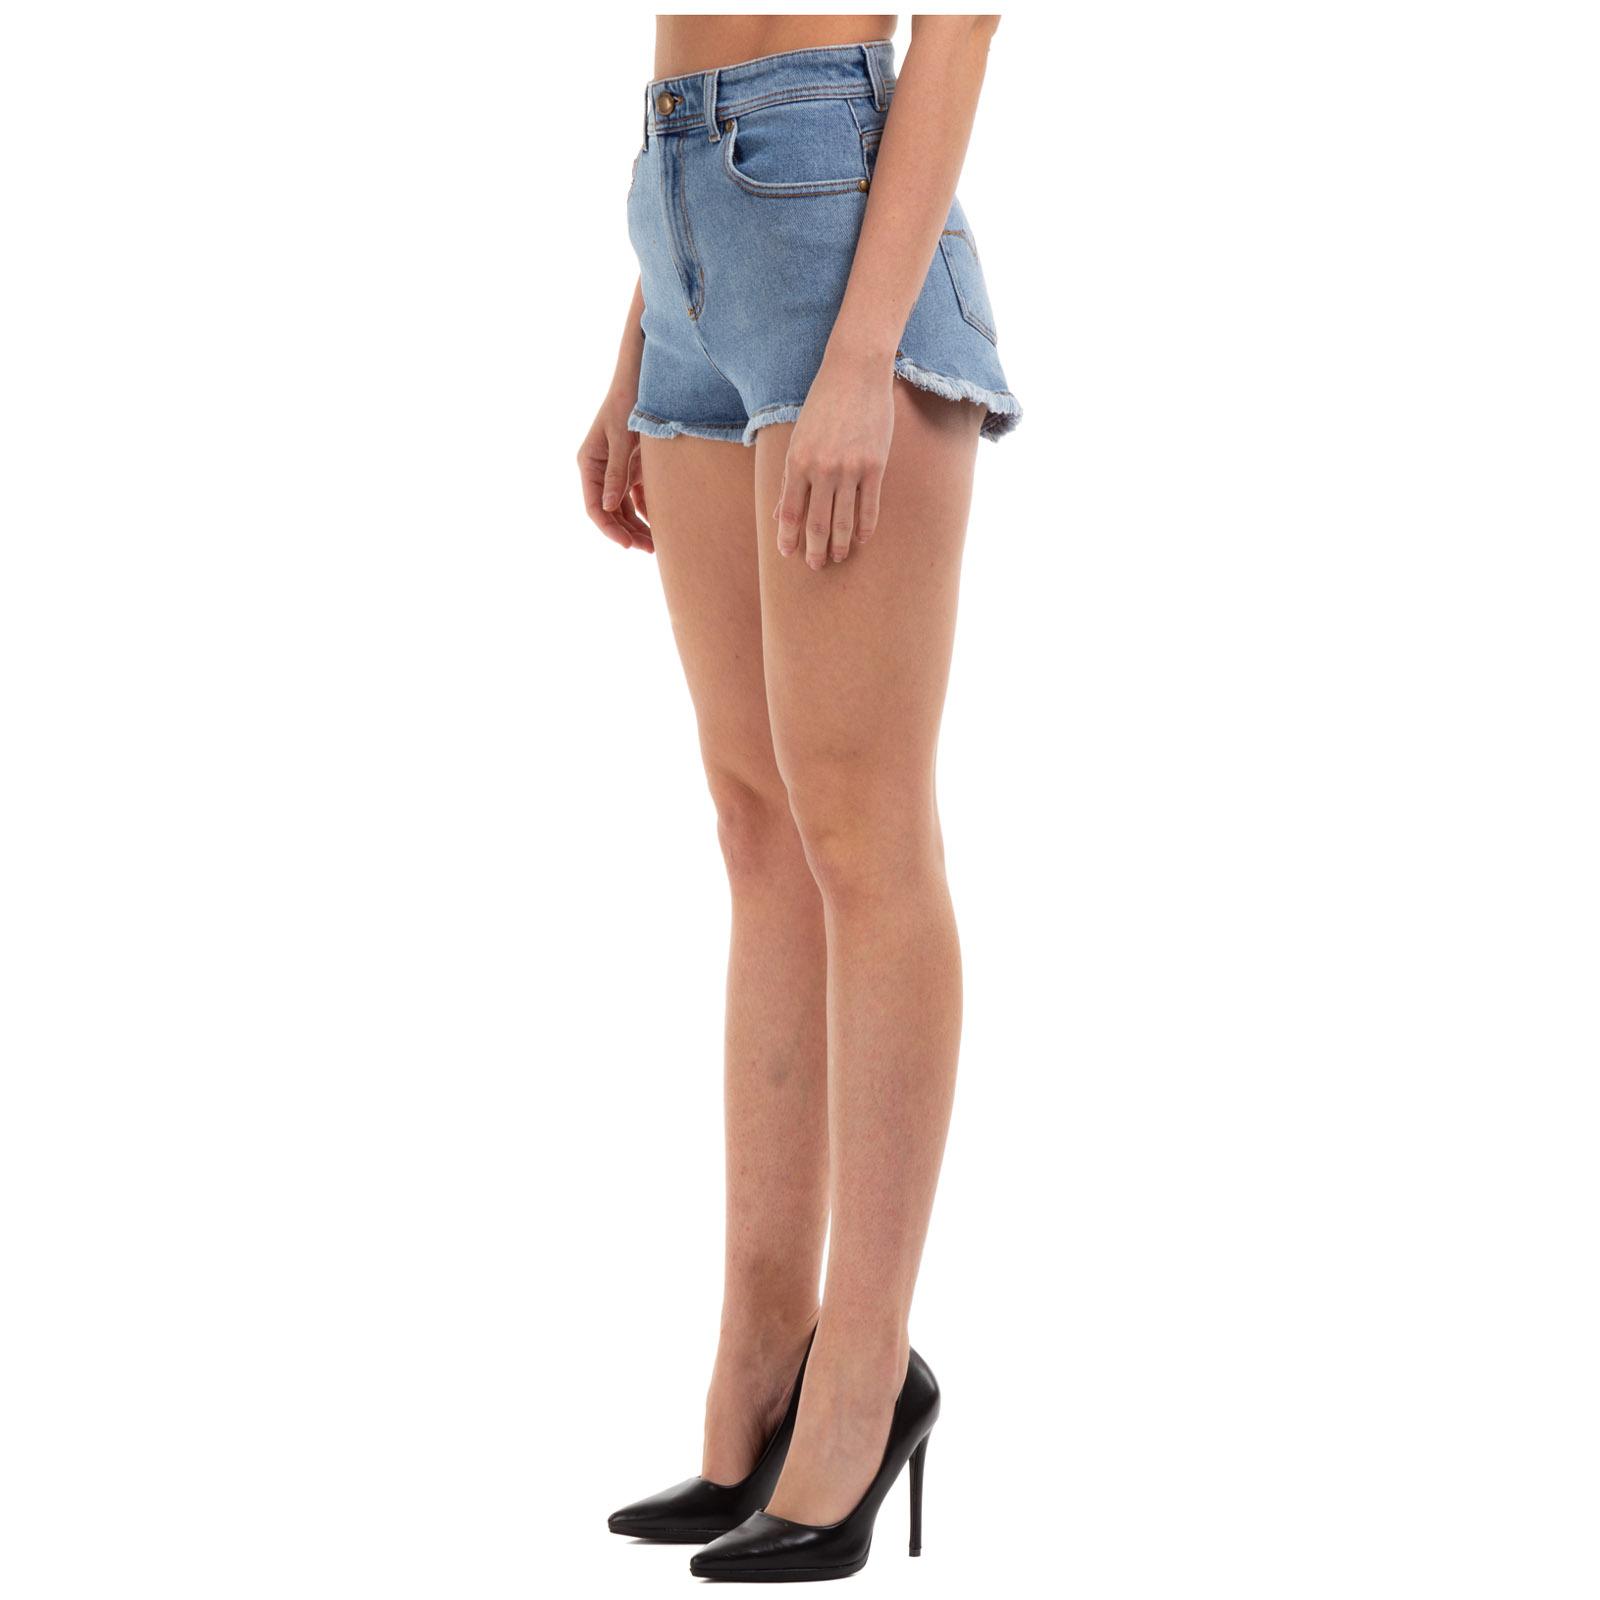 Short Versace Jeans Couture Ea3hvb13q Eaob5b E904 Blu Frmoda Com